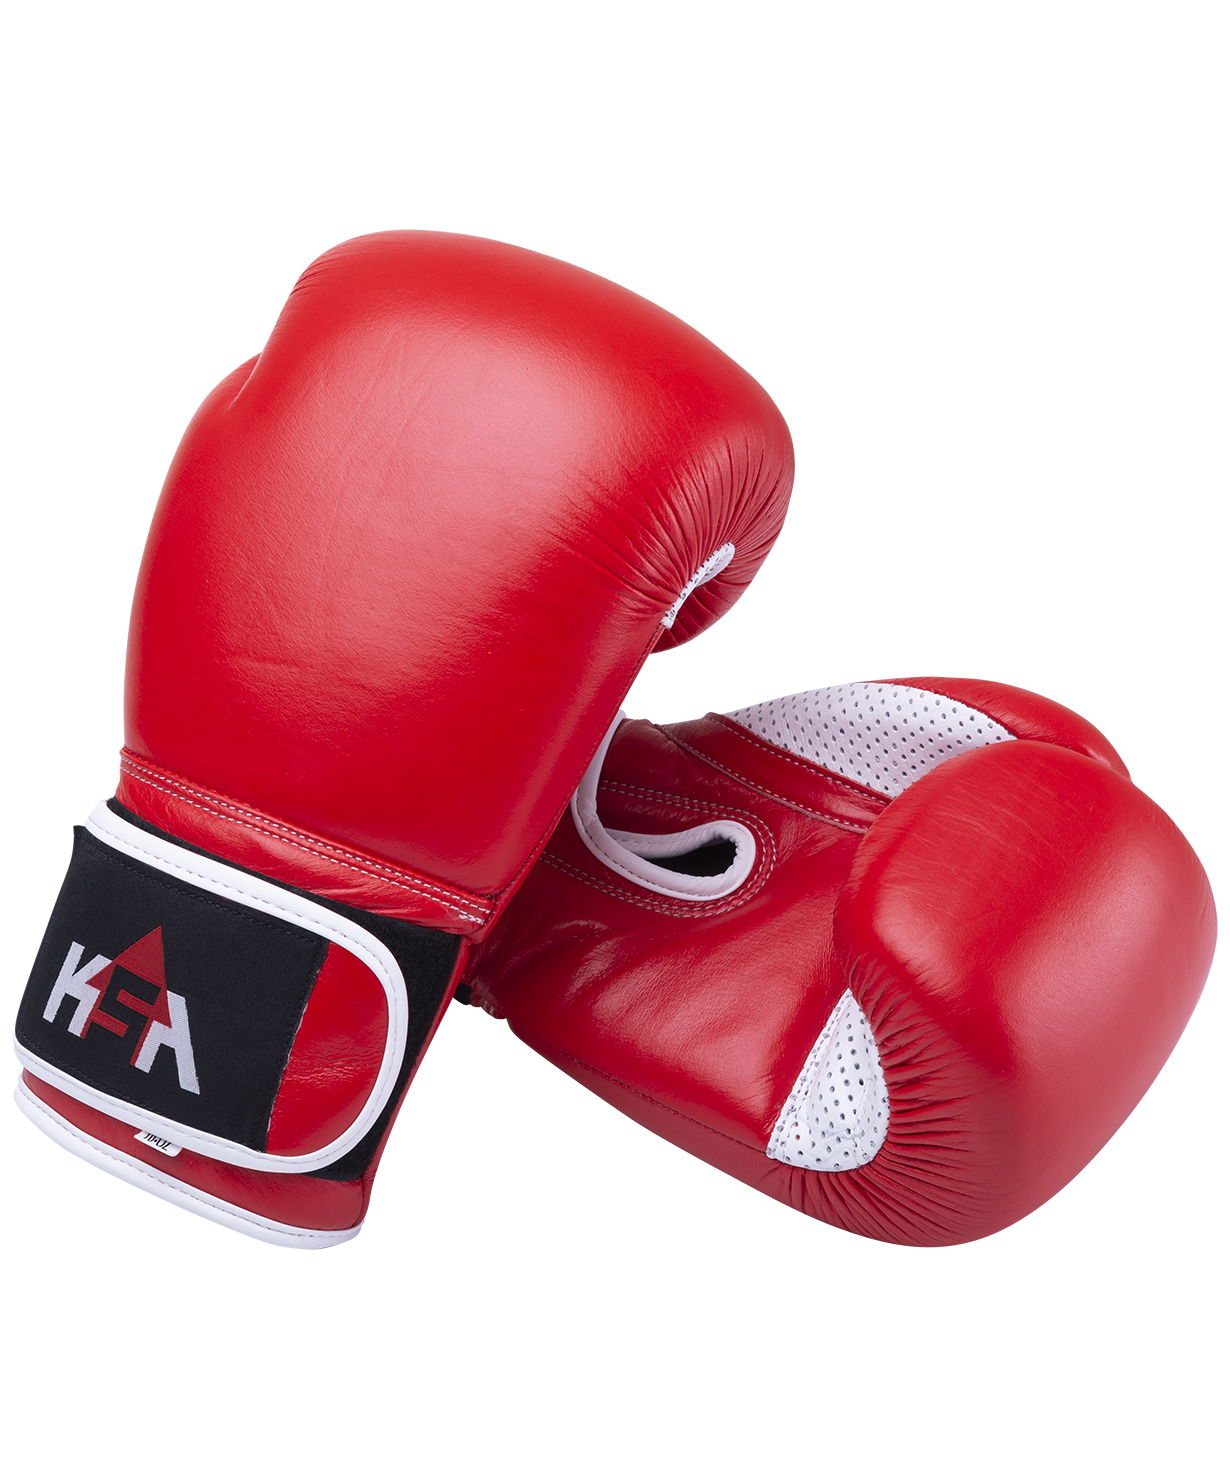 Перчатки Перчатки боксерские Wolf кожа 4047ae709b5d8cbd3415fd945a07185a.png